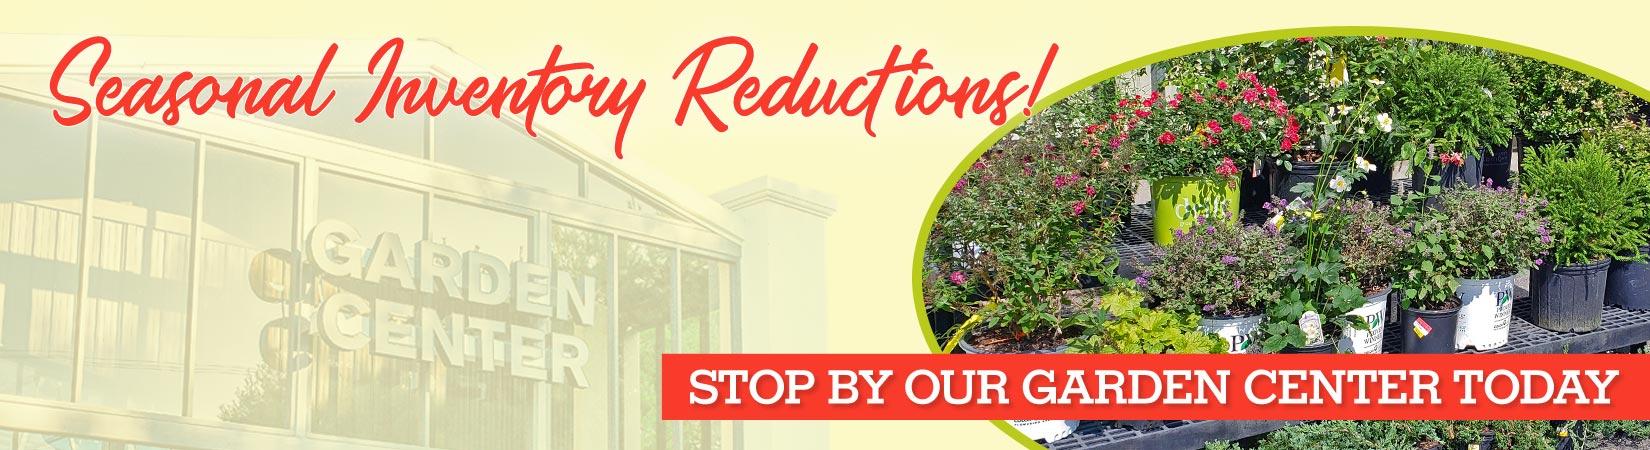 garden center seasonal inventory reduction